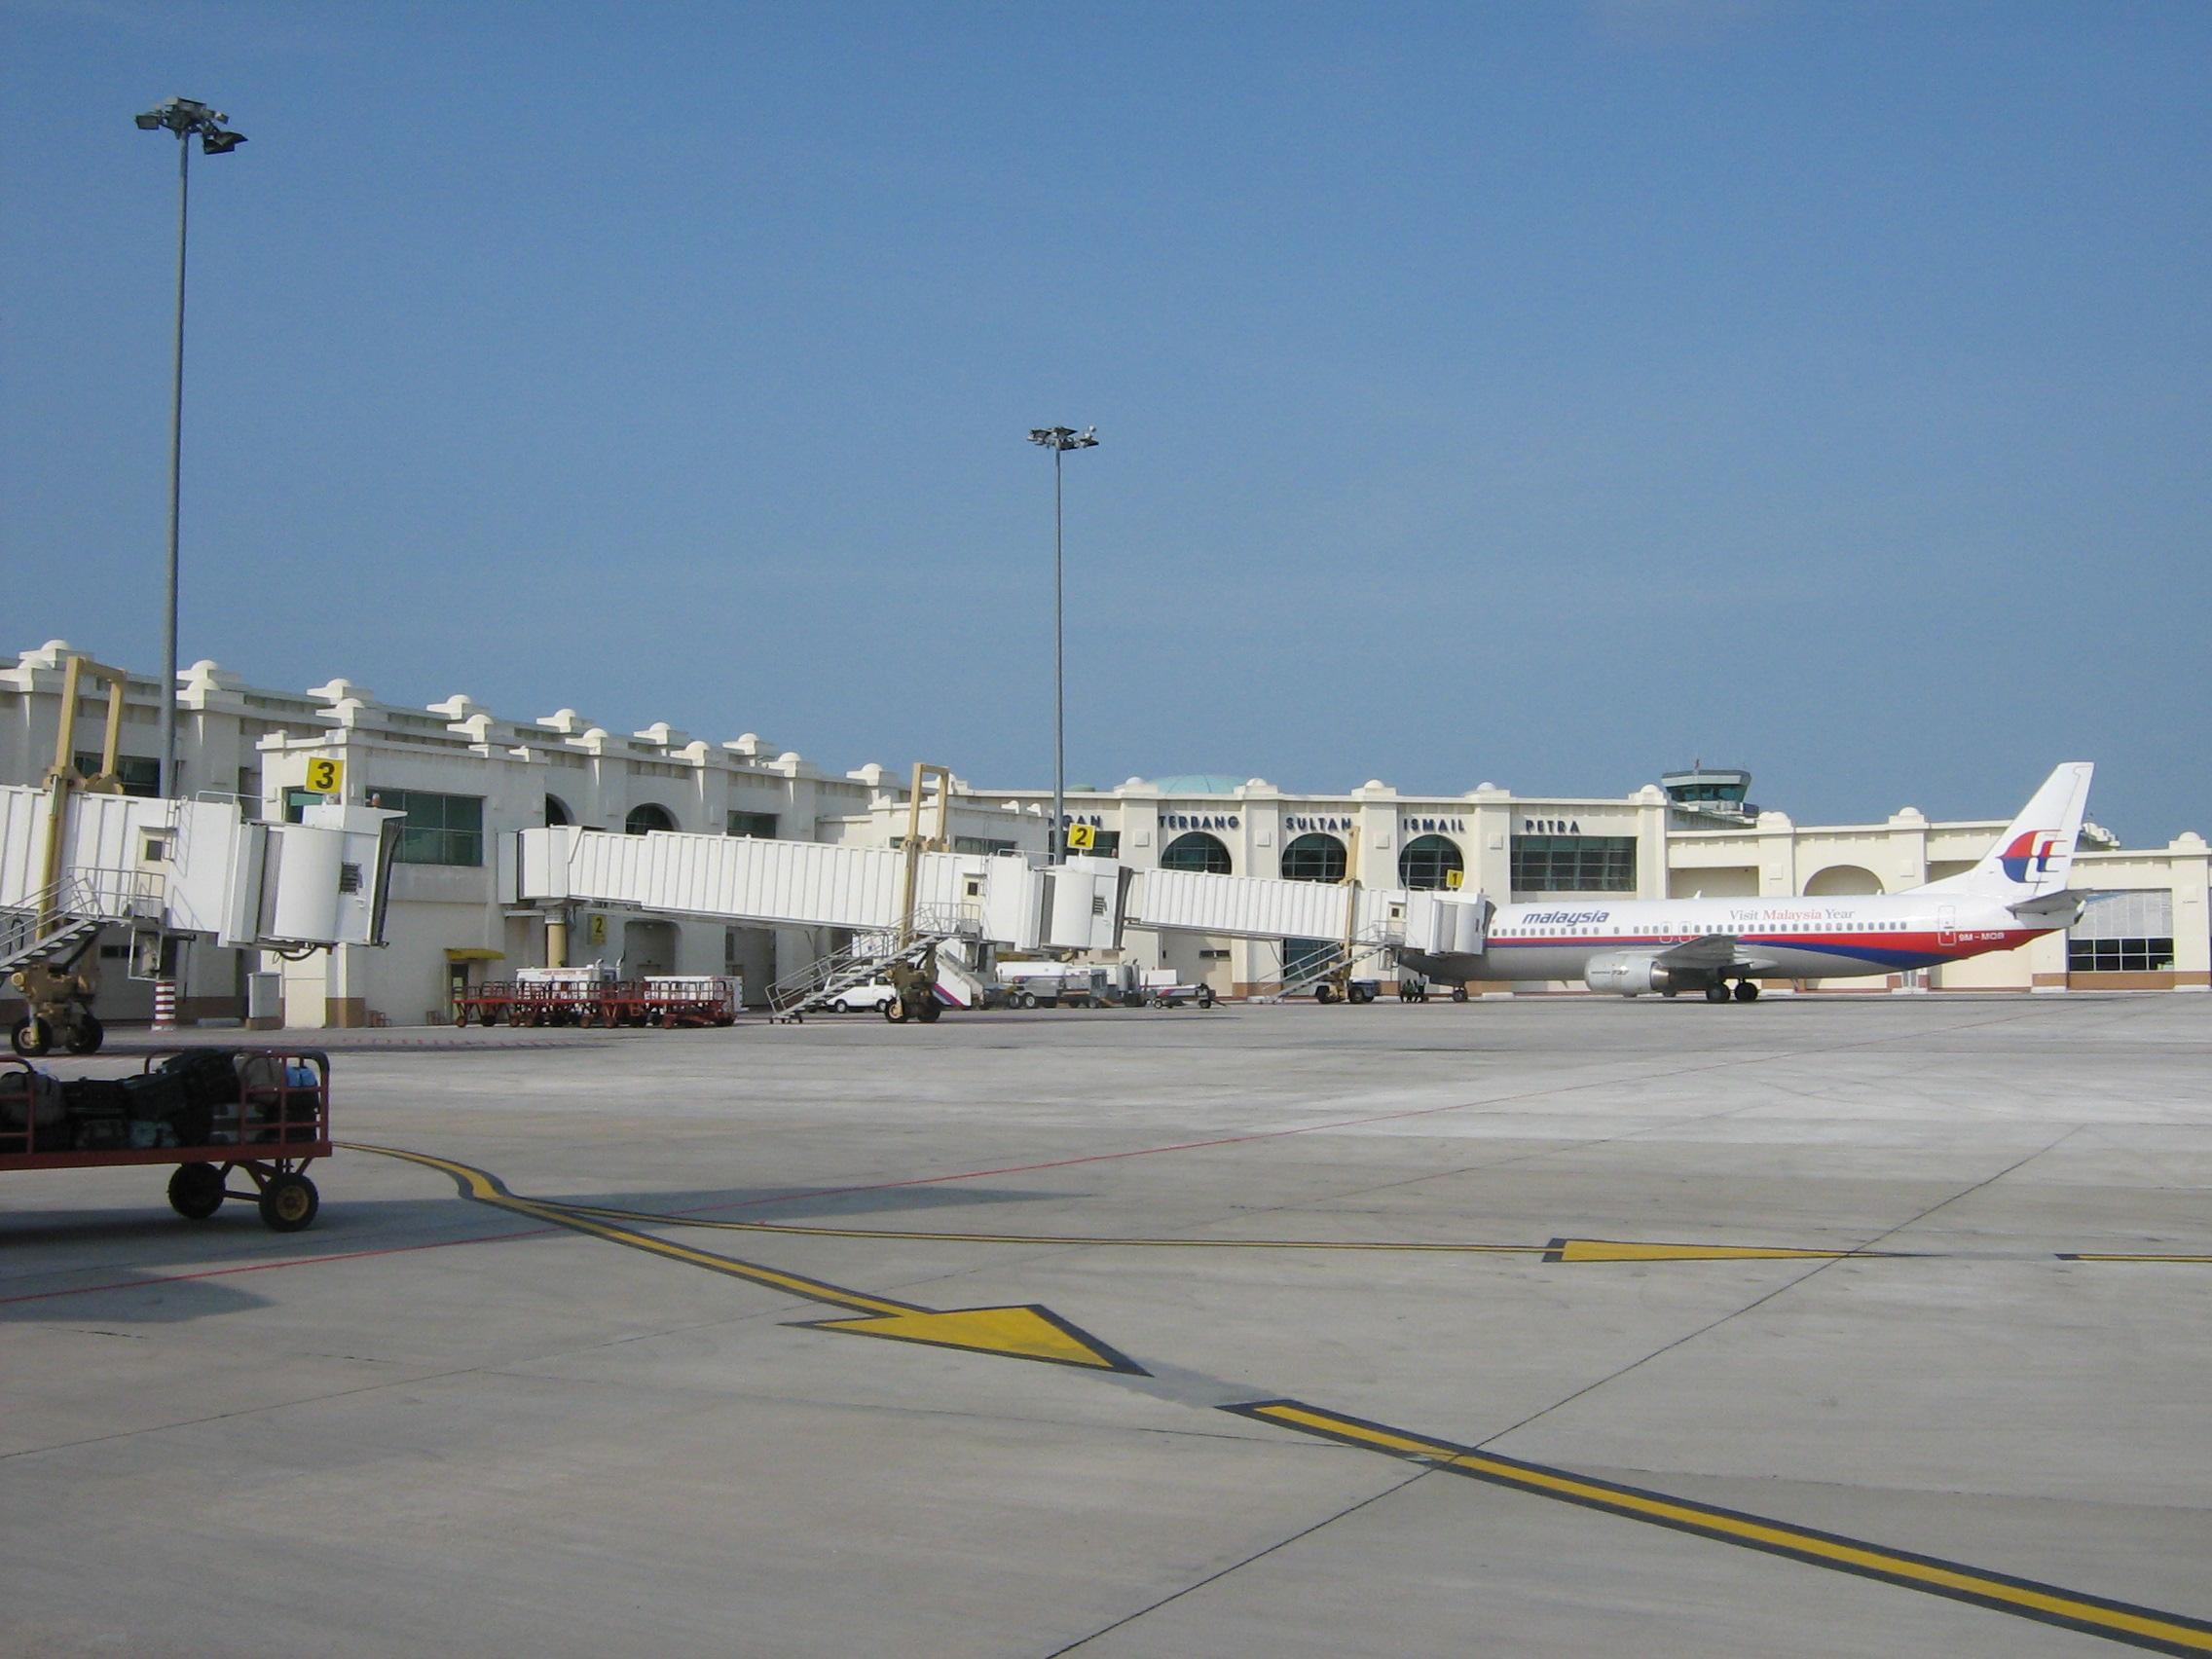 White apron malaysia - File Kota Bharu Airport Apron View Jpg